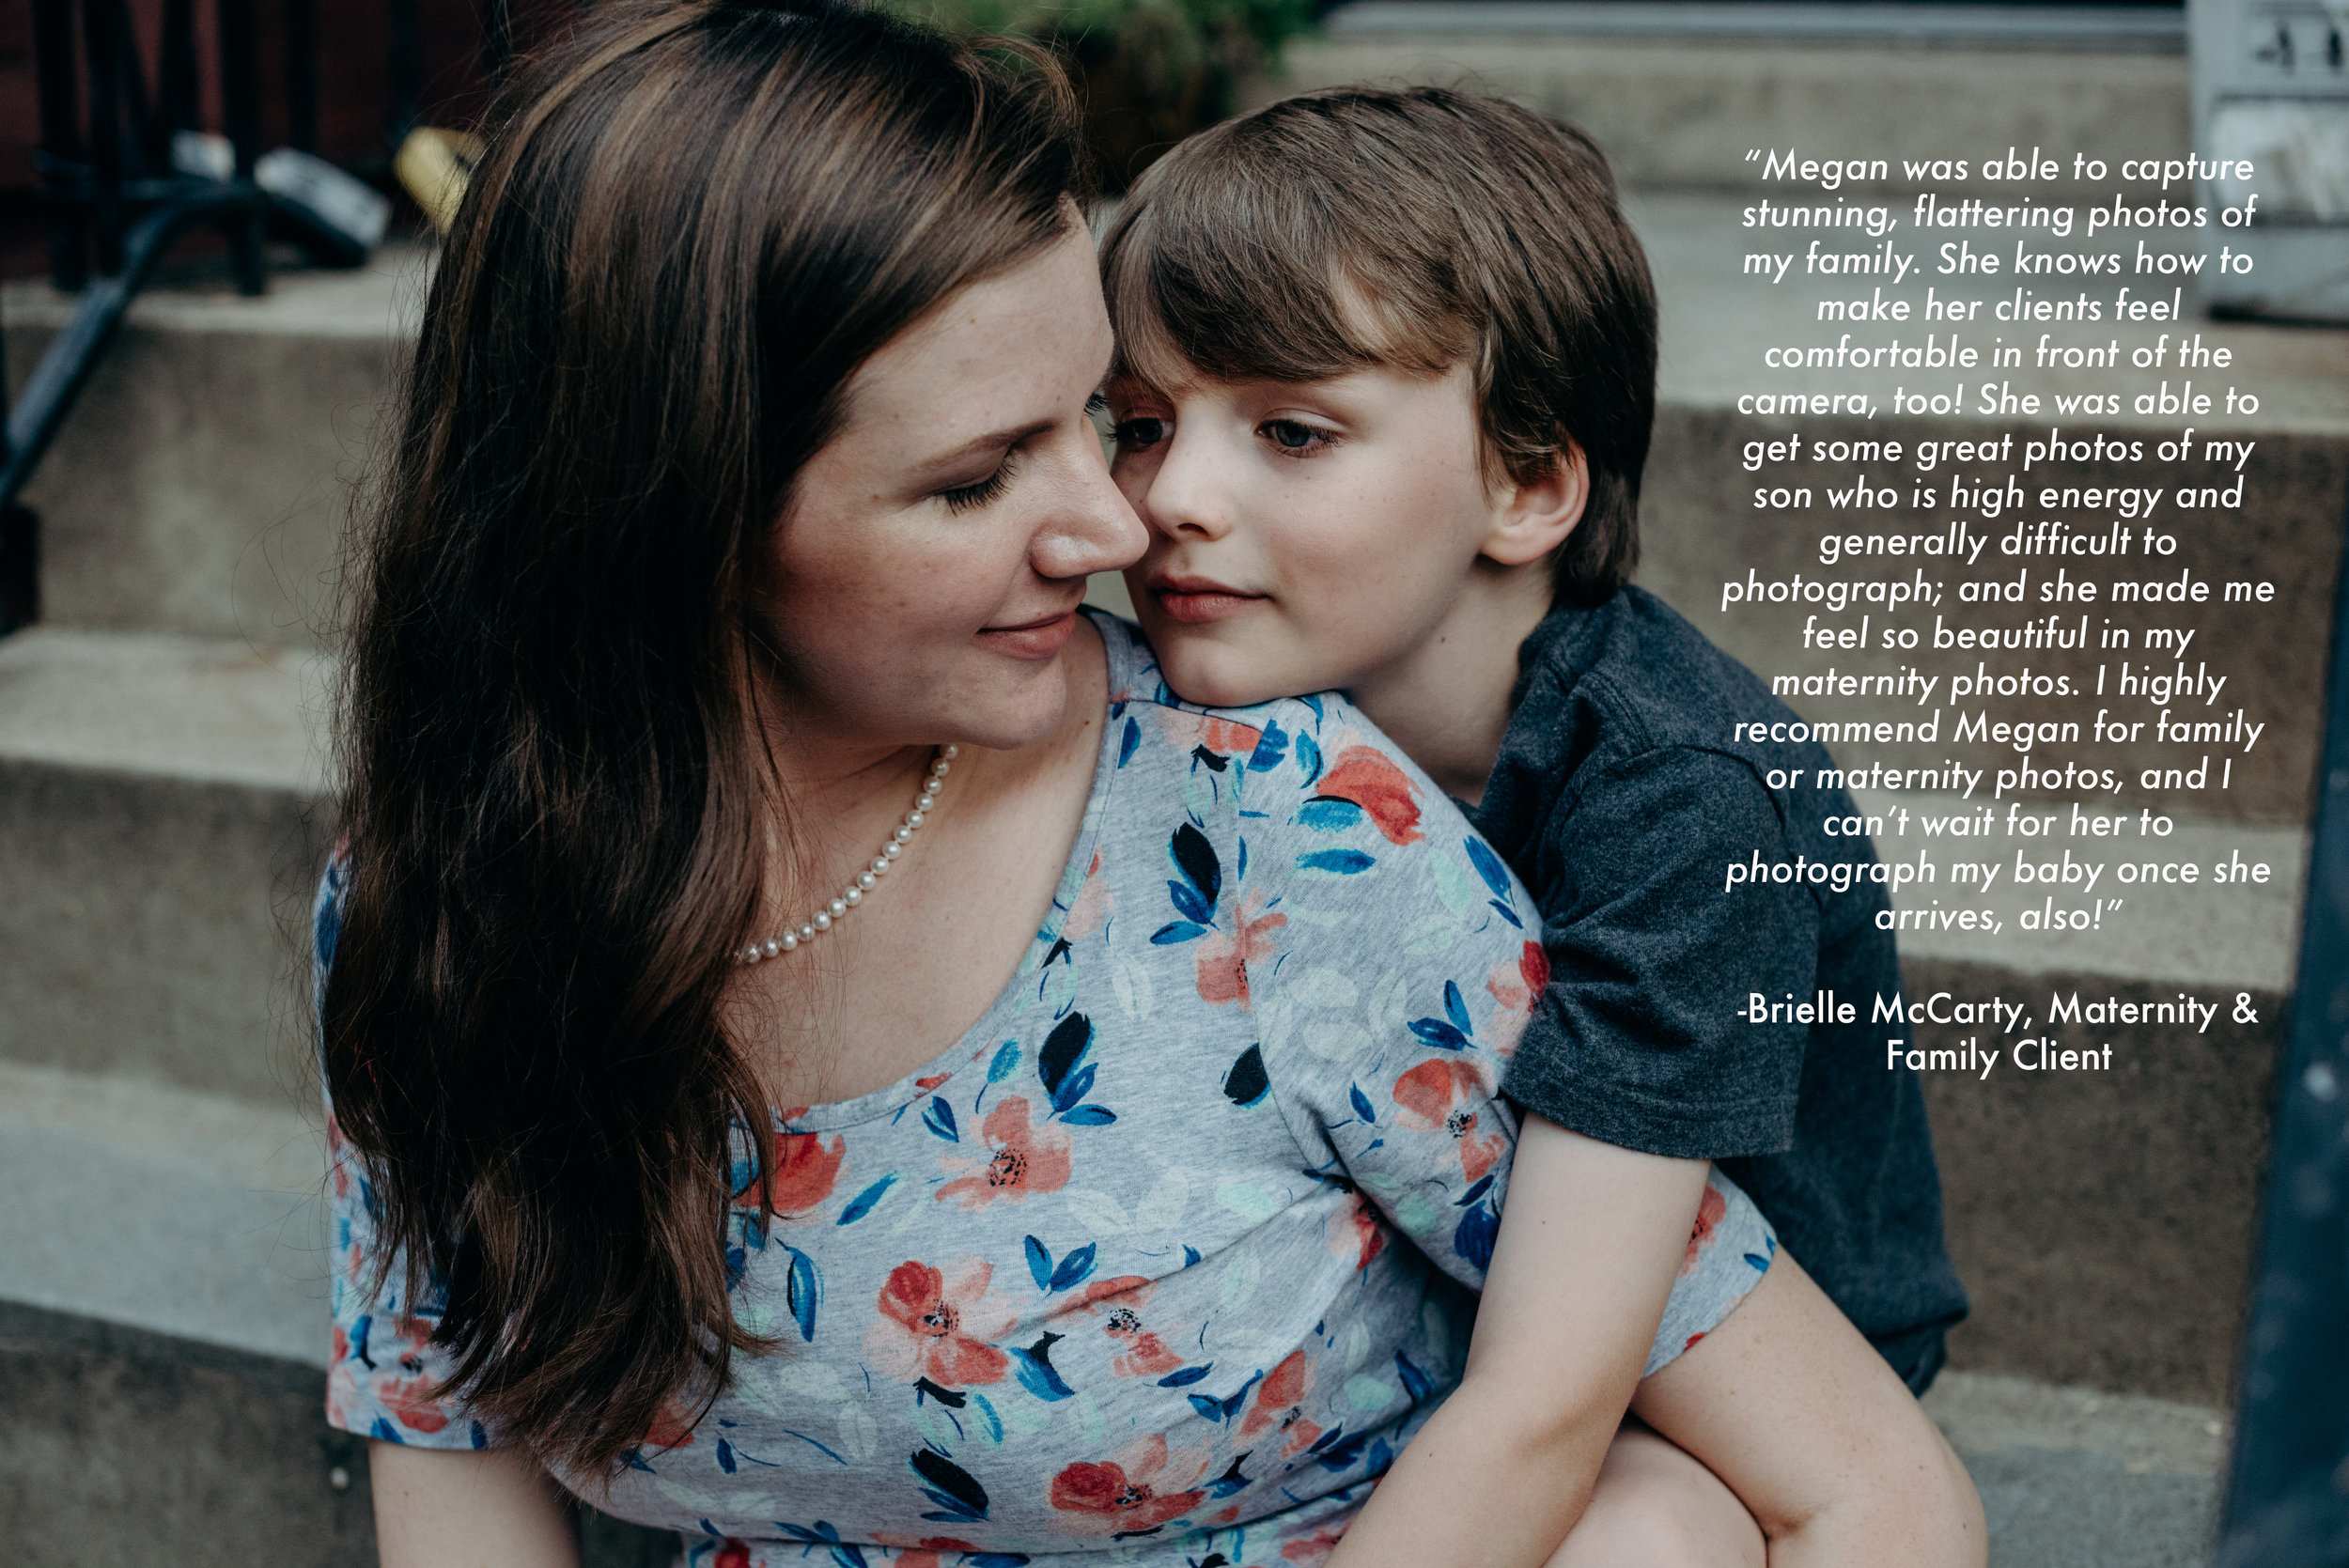 Megan-graham-photography-maternity-family-review.jpg